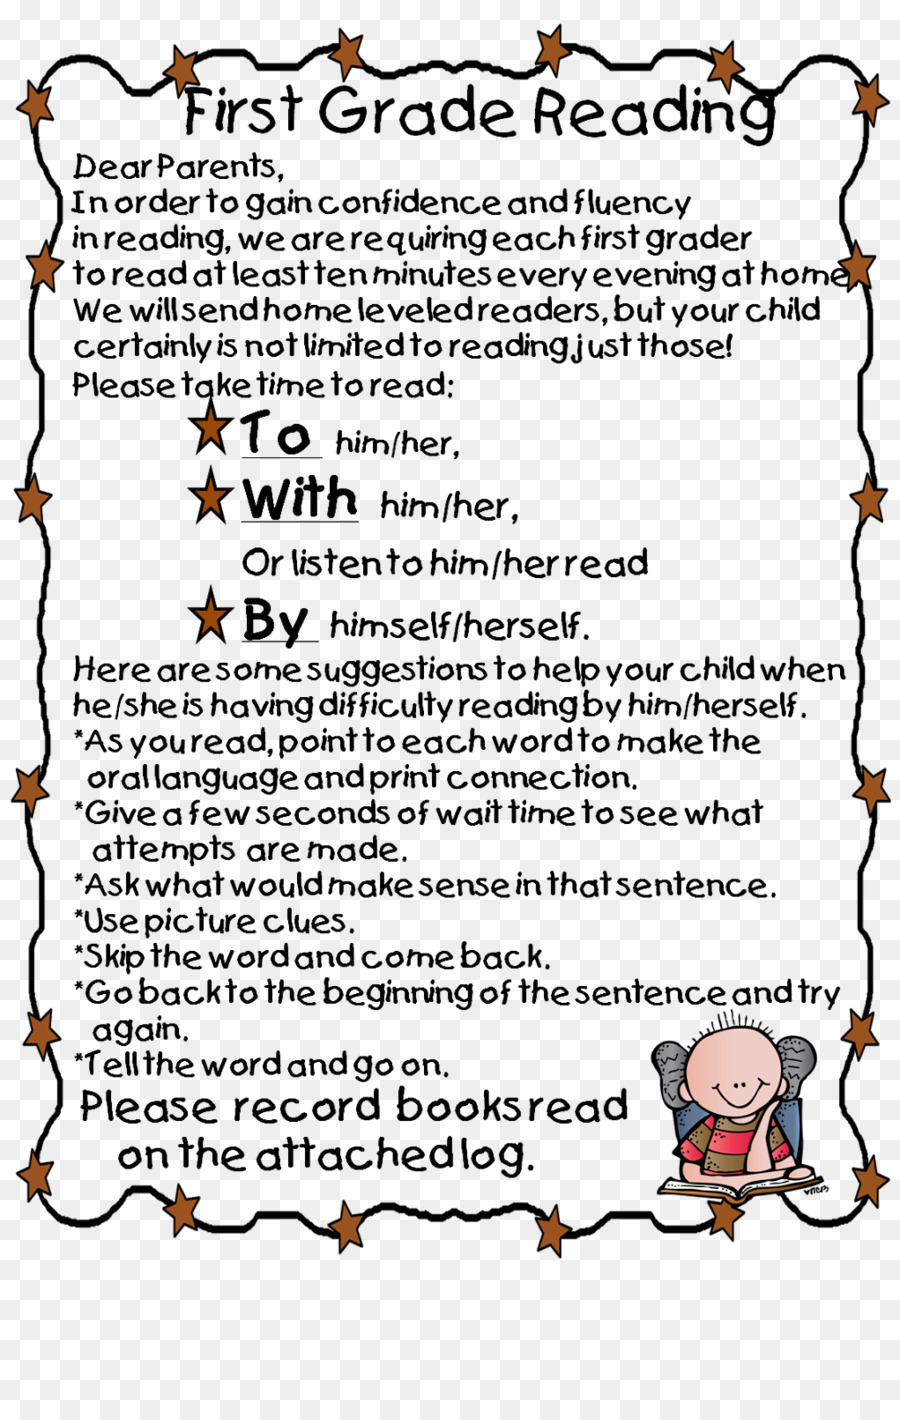 - Kindergarten Cartoon Png Download - 1021*1600 - Free Transparent